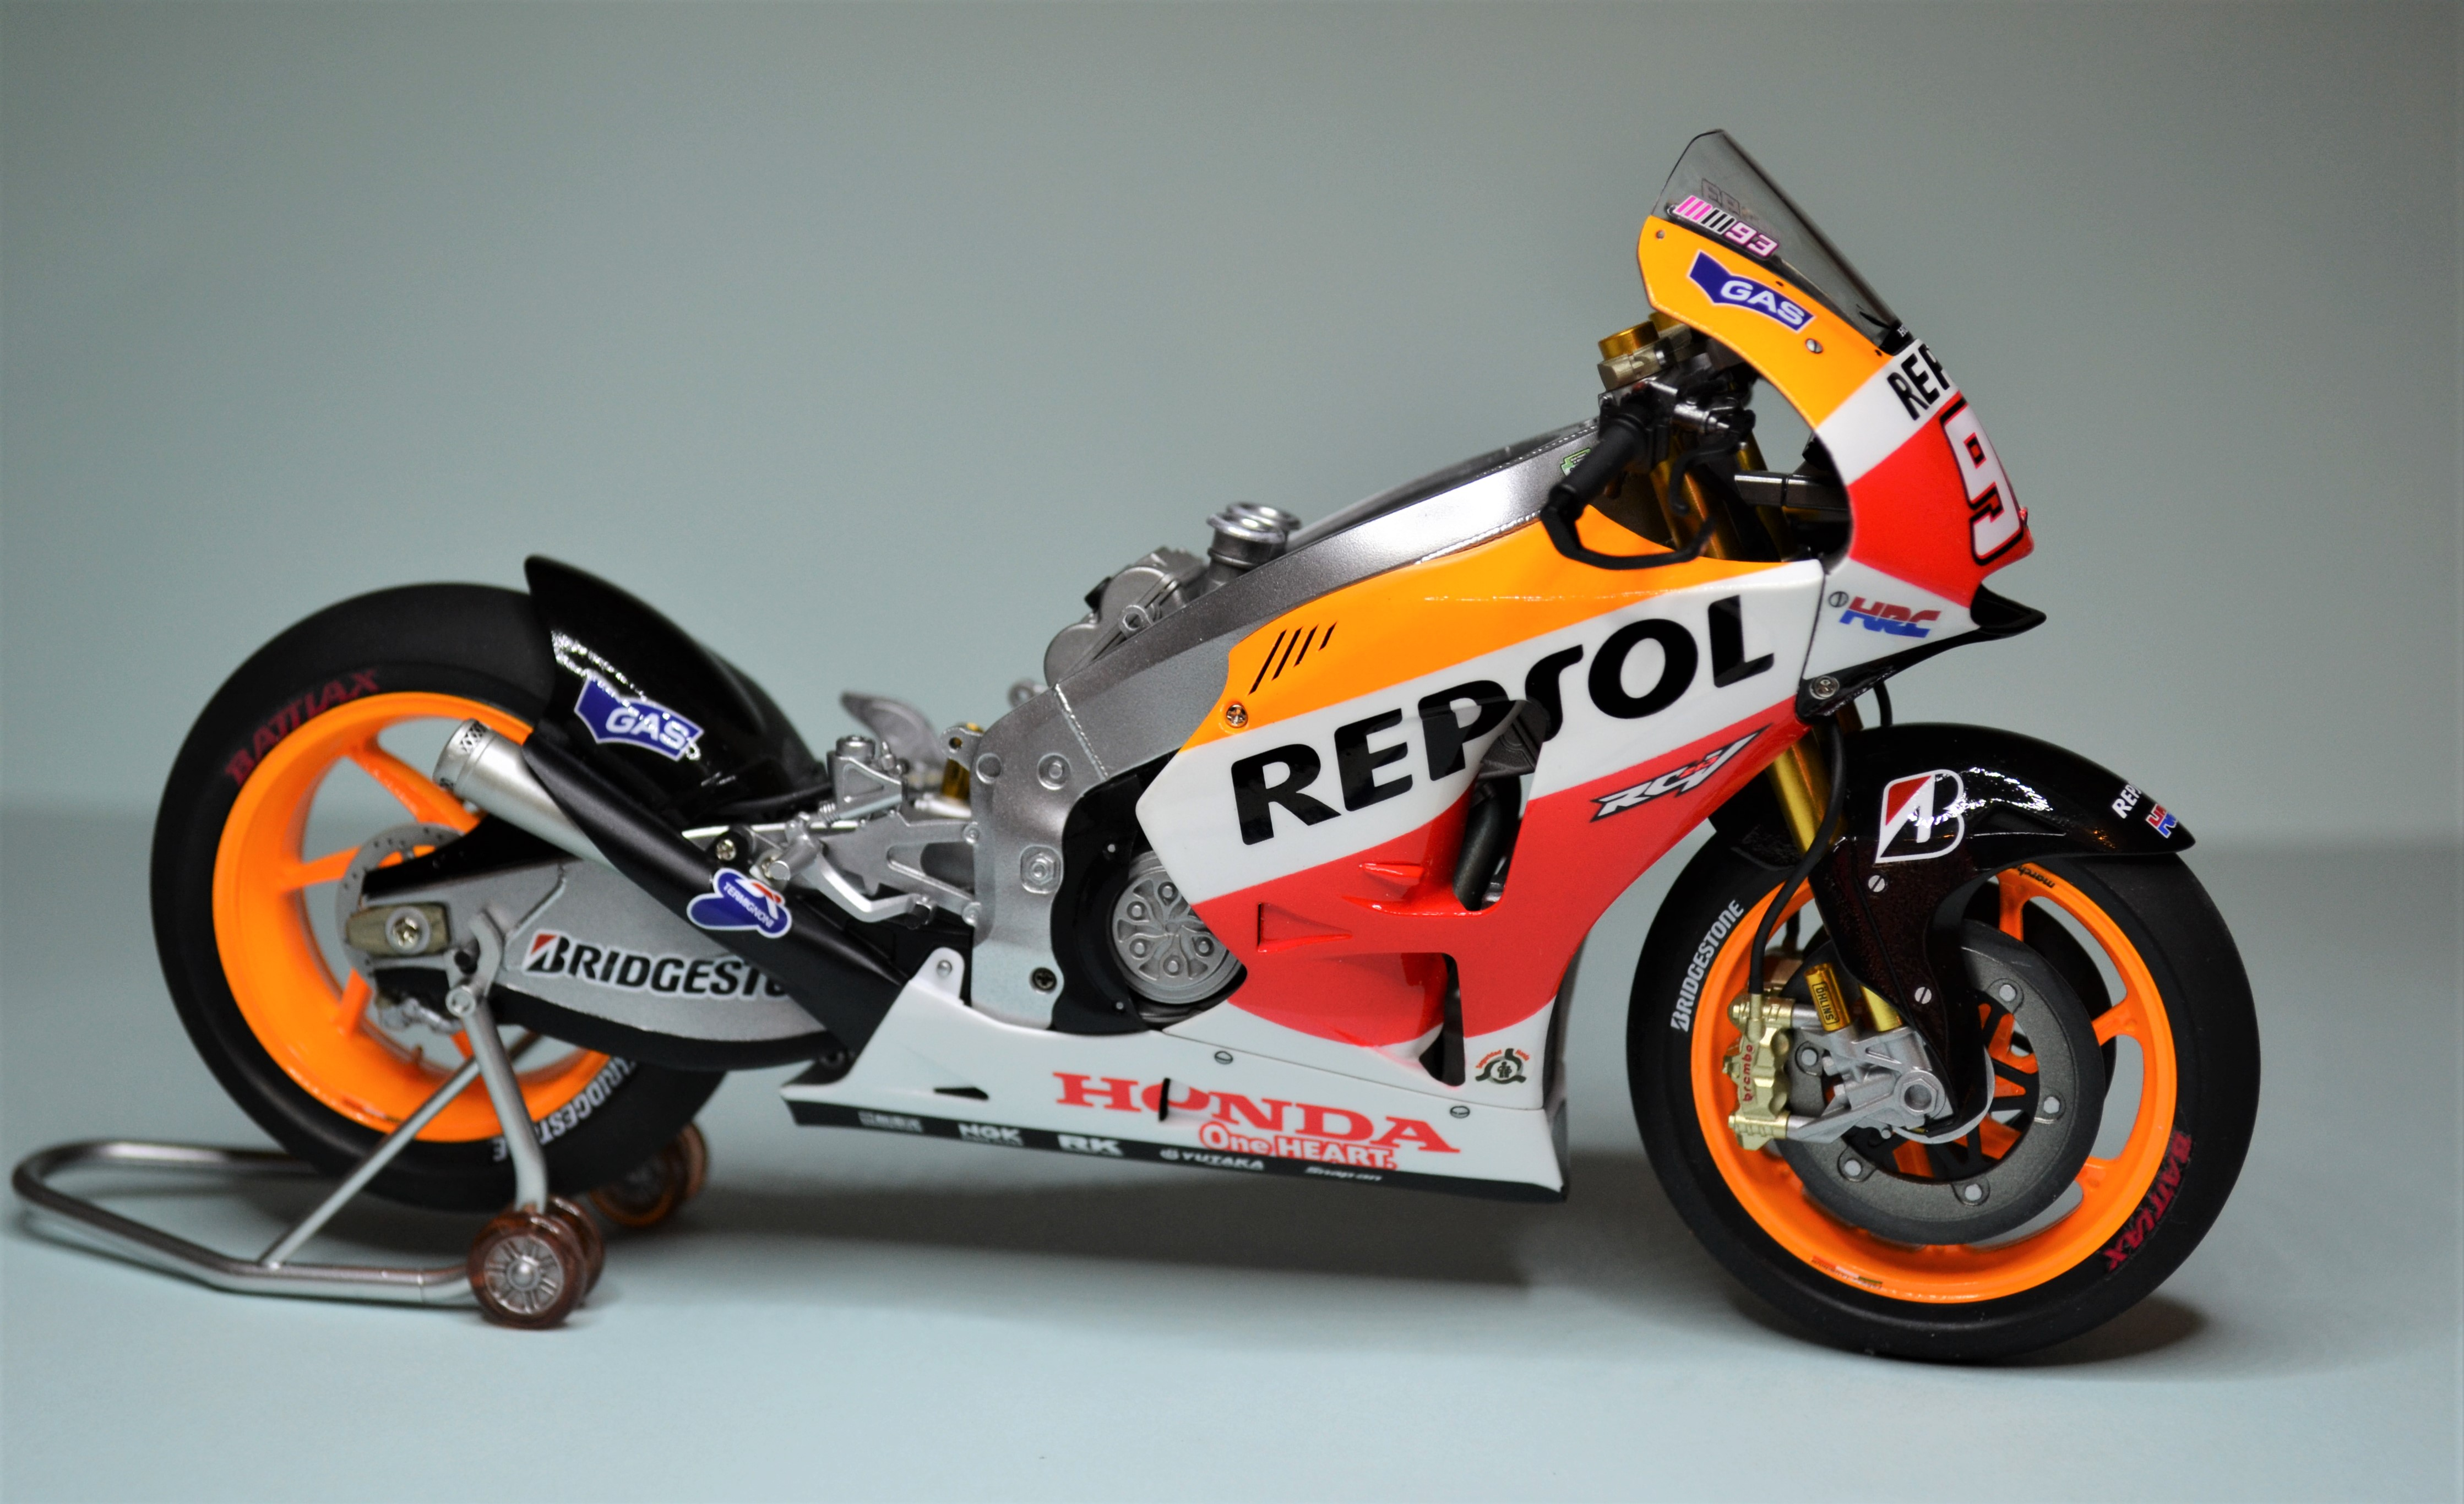 Honda Repsol Marc Marquez 1/12  - Page 2 170729030624287429